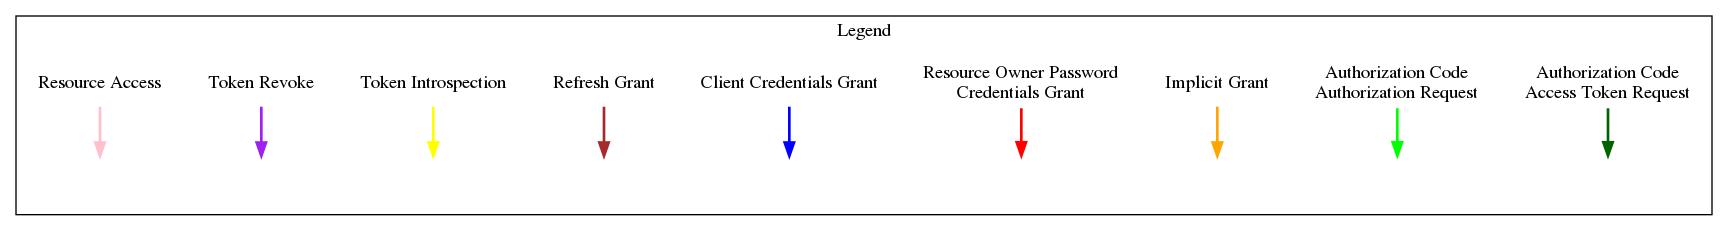 Creating a Provider — OAuthLib 3 1 0-dev documentation